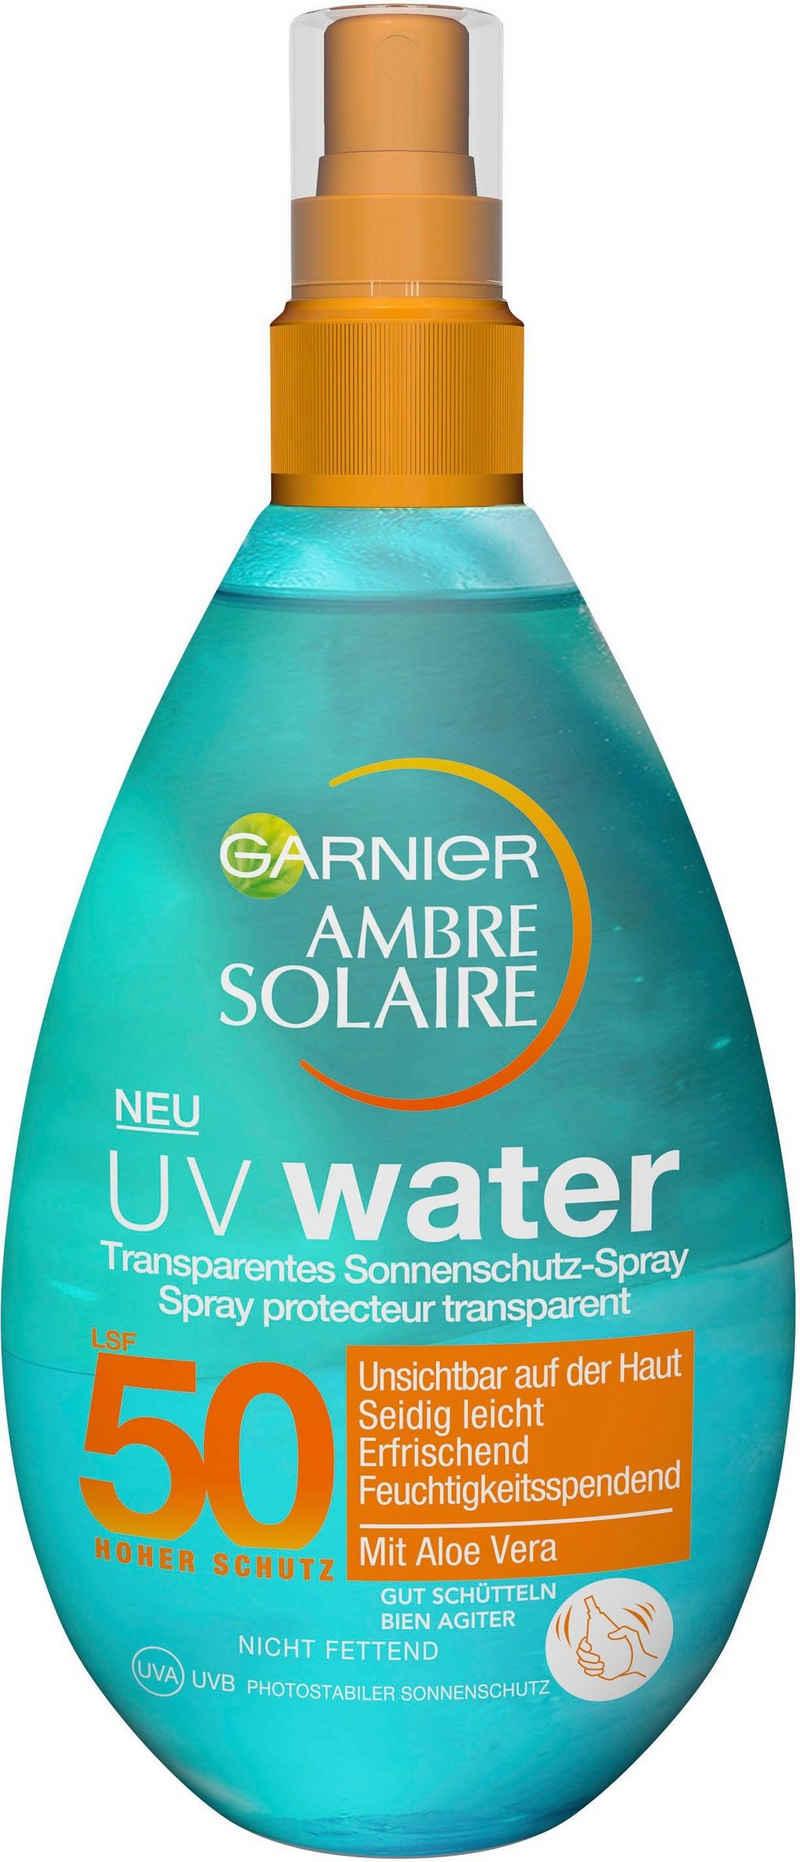 GARNIER Sonnenschutzspray »Ambre Solaire UV Water LSF 50«